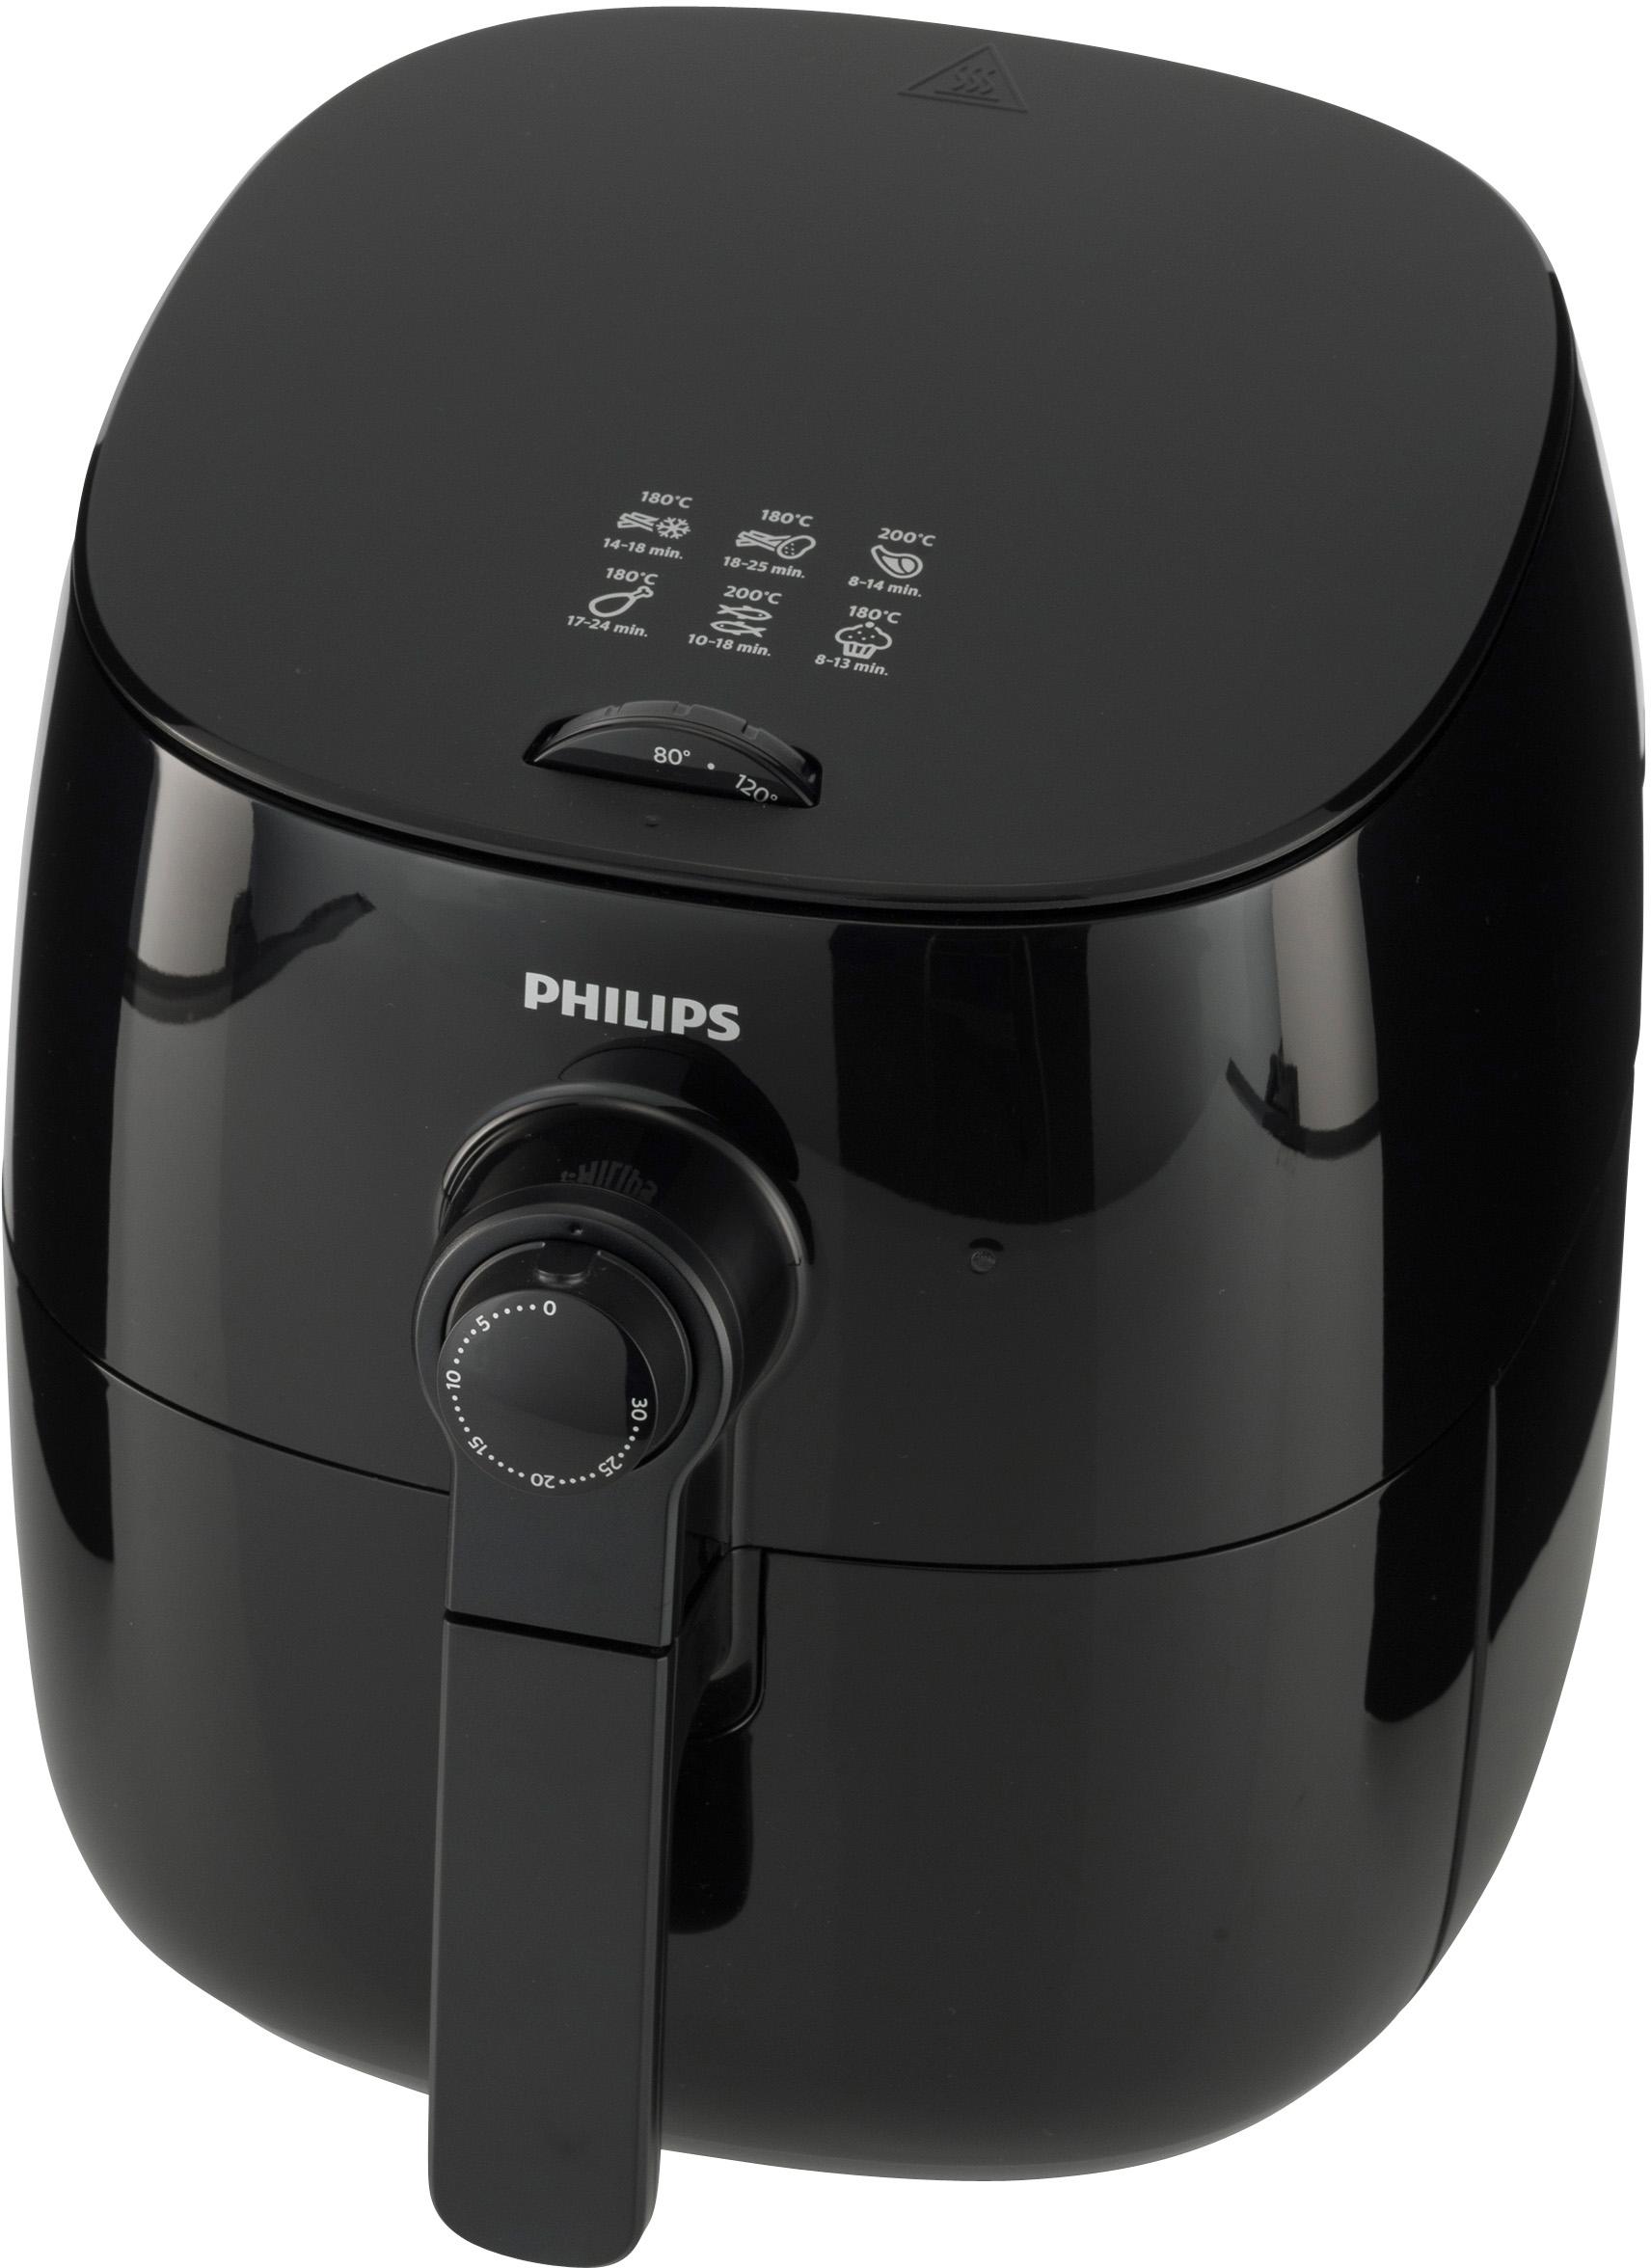 philips-hd9621-90